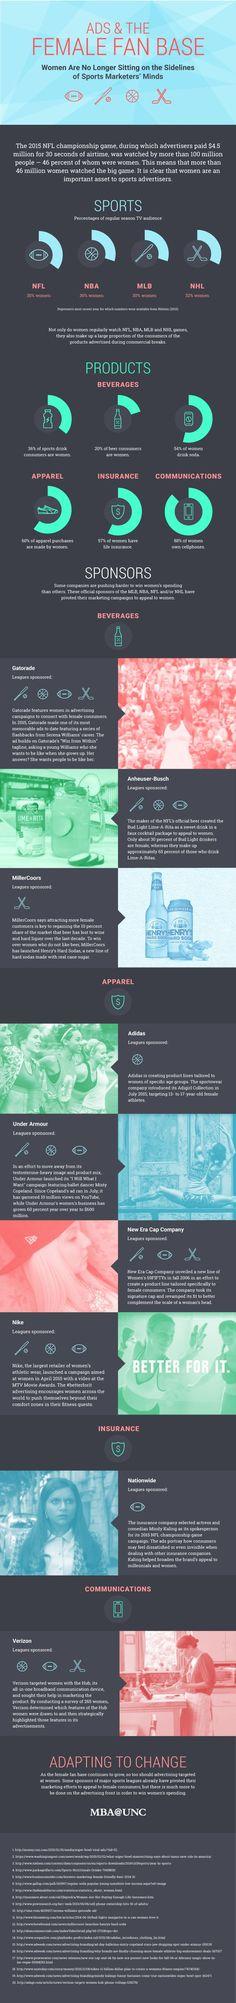 The Evolution of Marketing To Female Sports Fans - Forbes#44eeb3c5462e#44eeb3c5462e#44eeb3c5462e